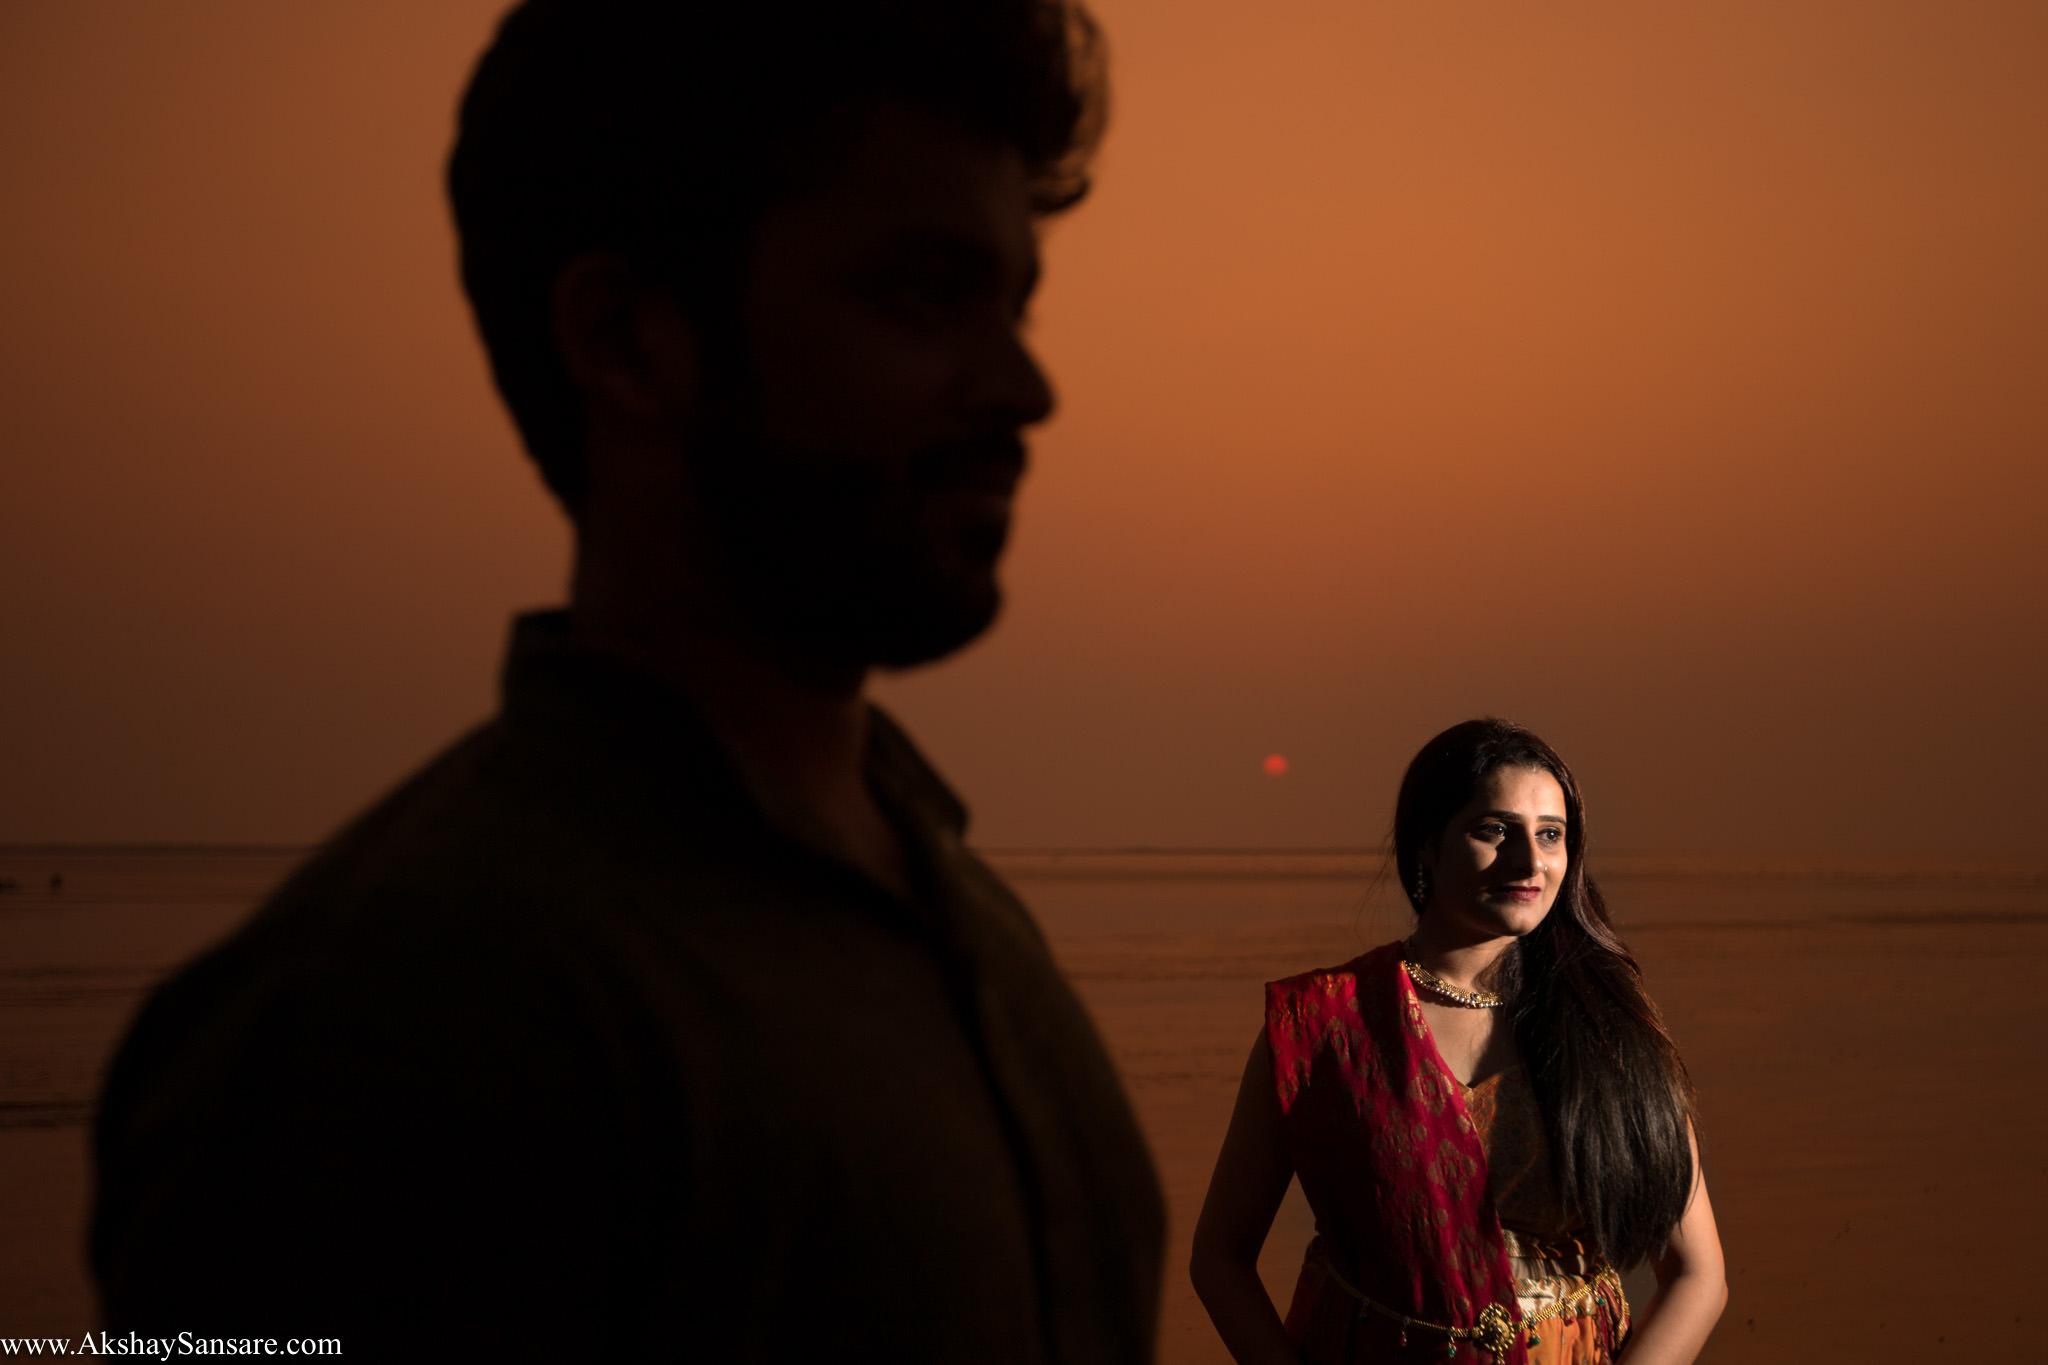 Priyanka x Sushank Pre-wedding Best Candid Photographer in Mumbai Akshay Sansare India(9).jpg